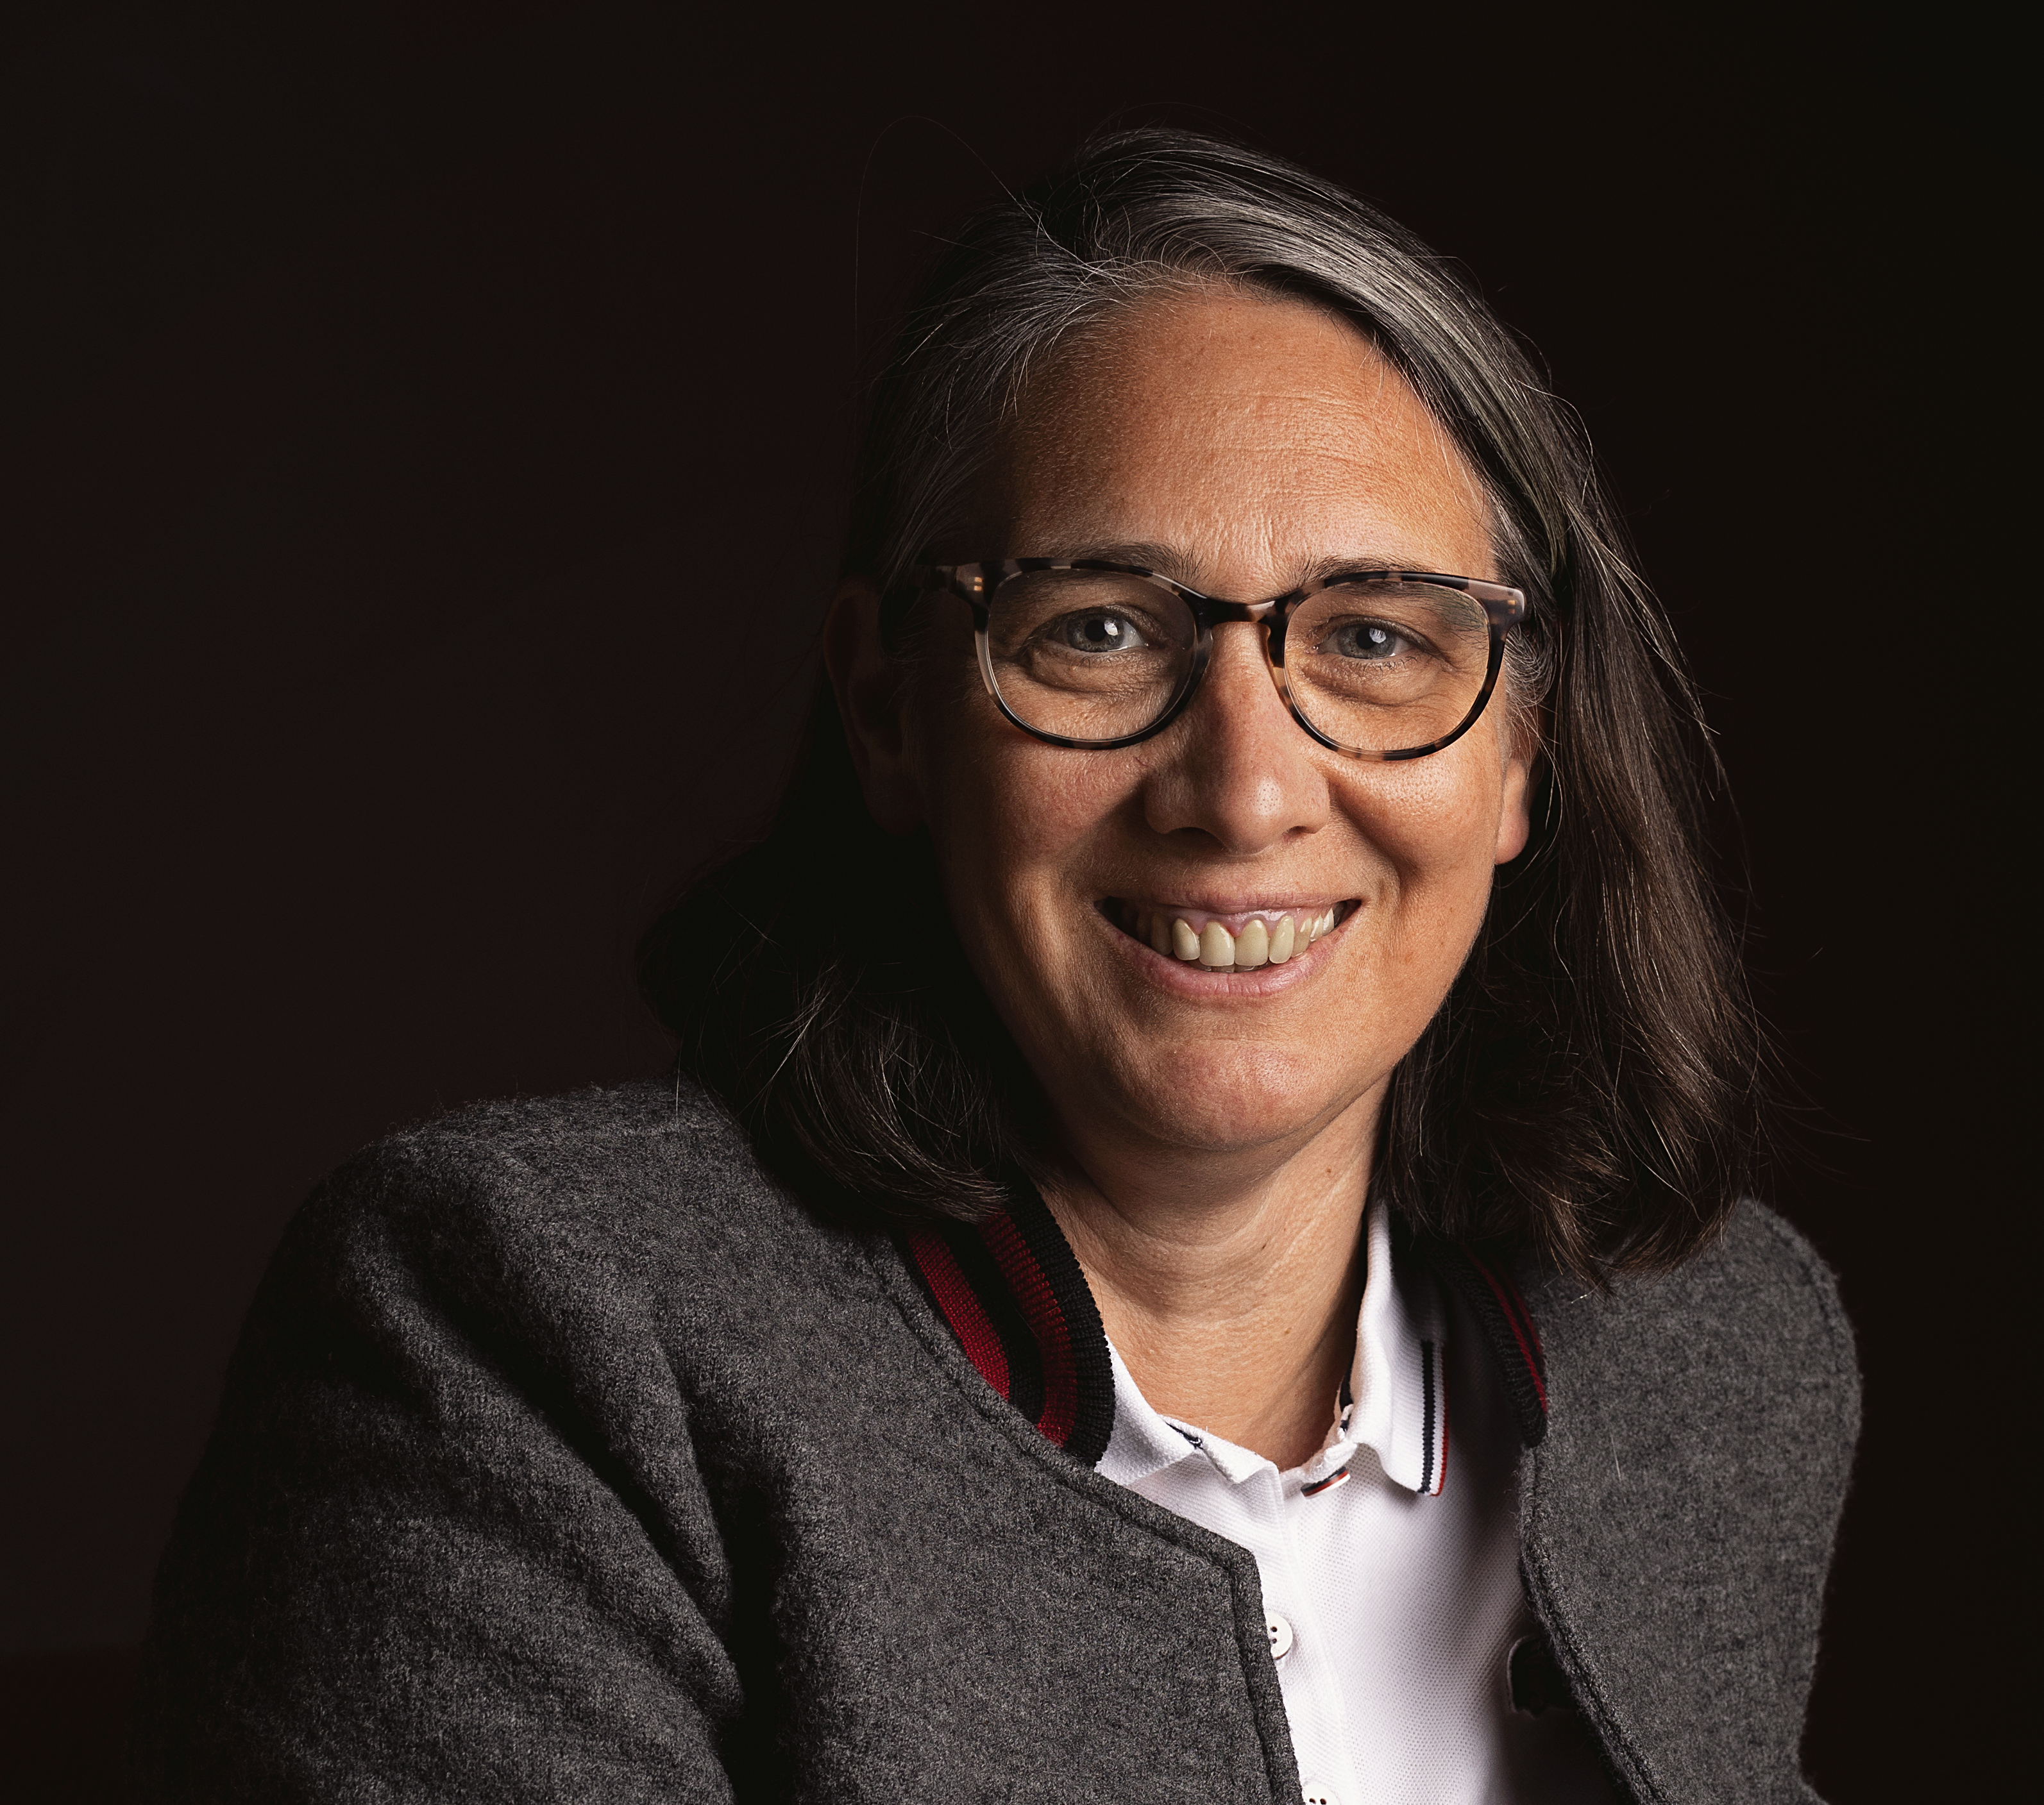 Marie-Laure Huet